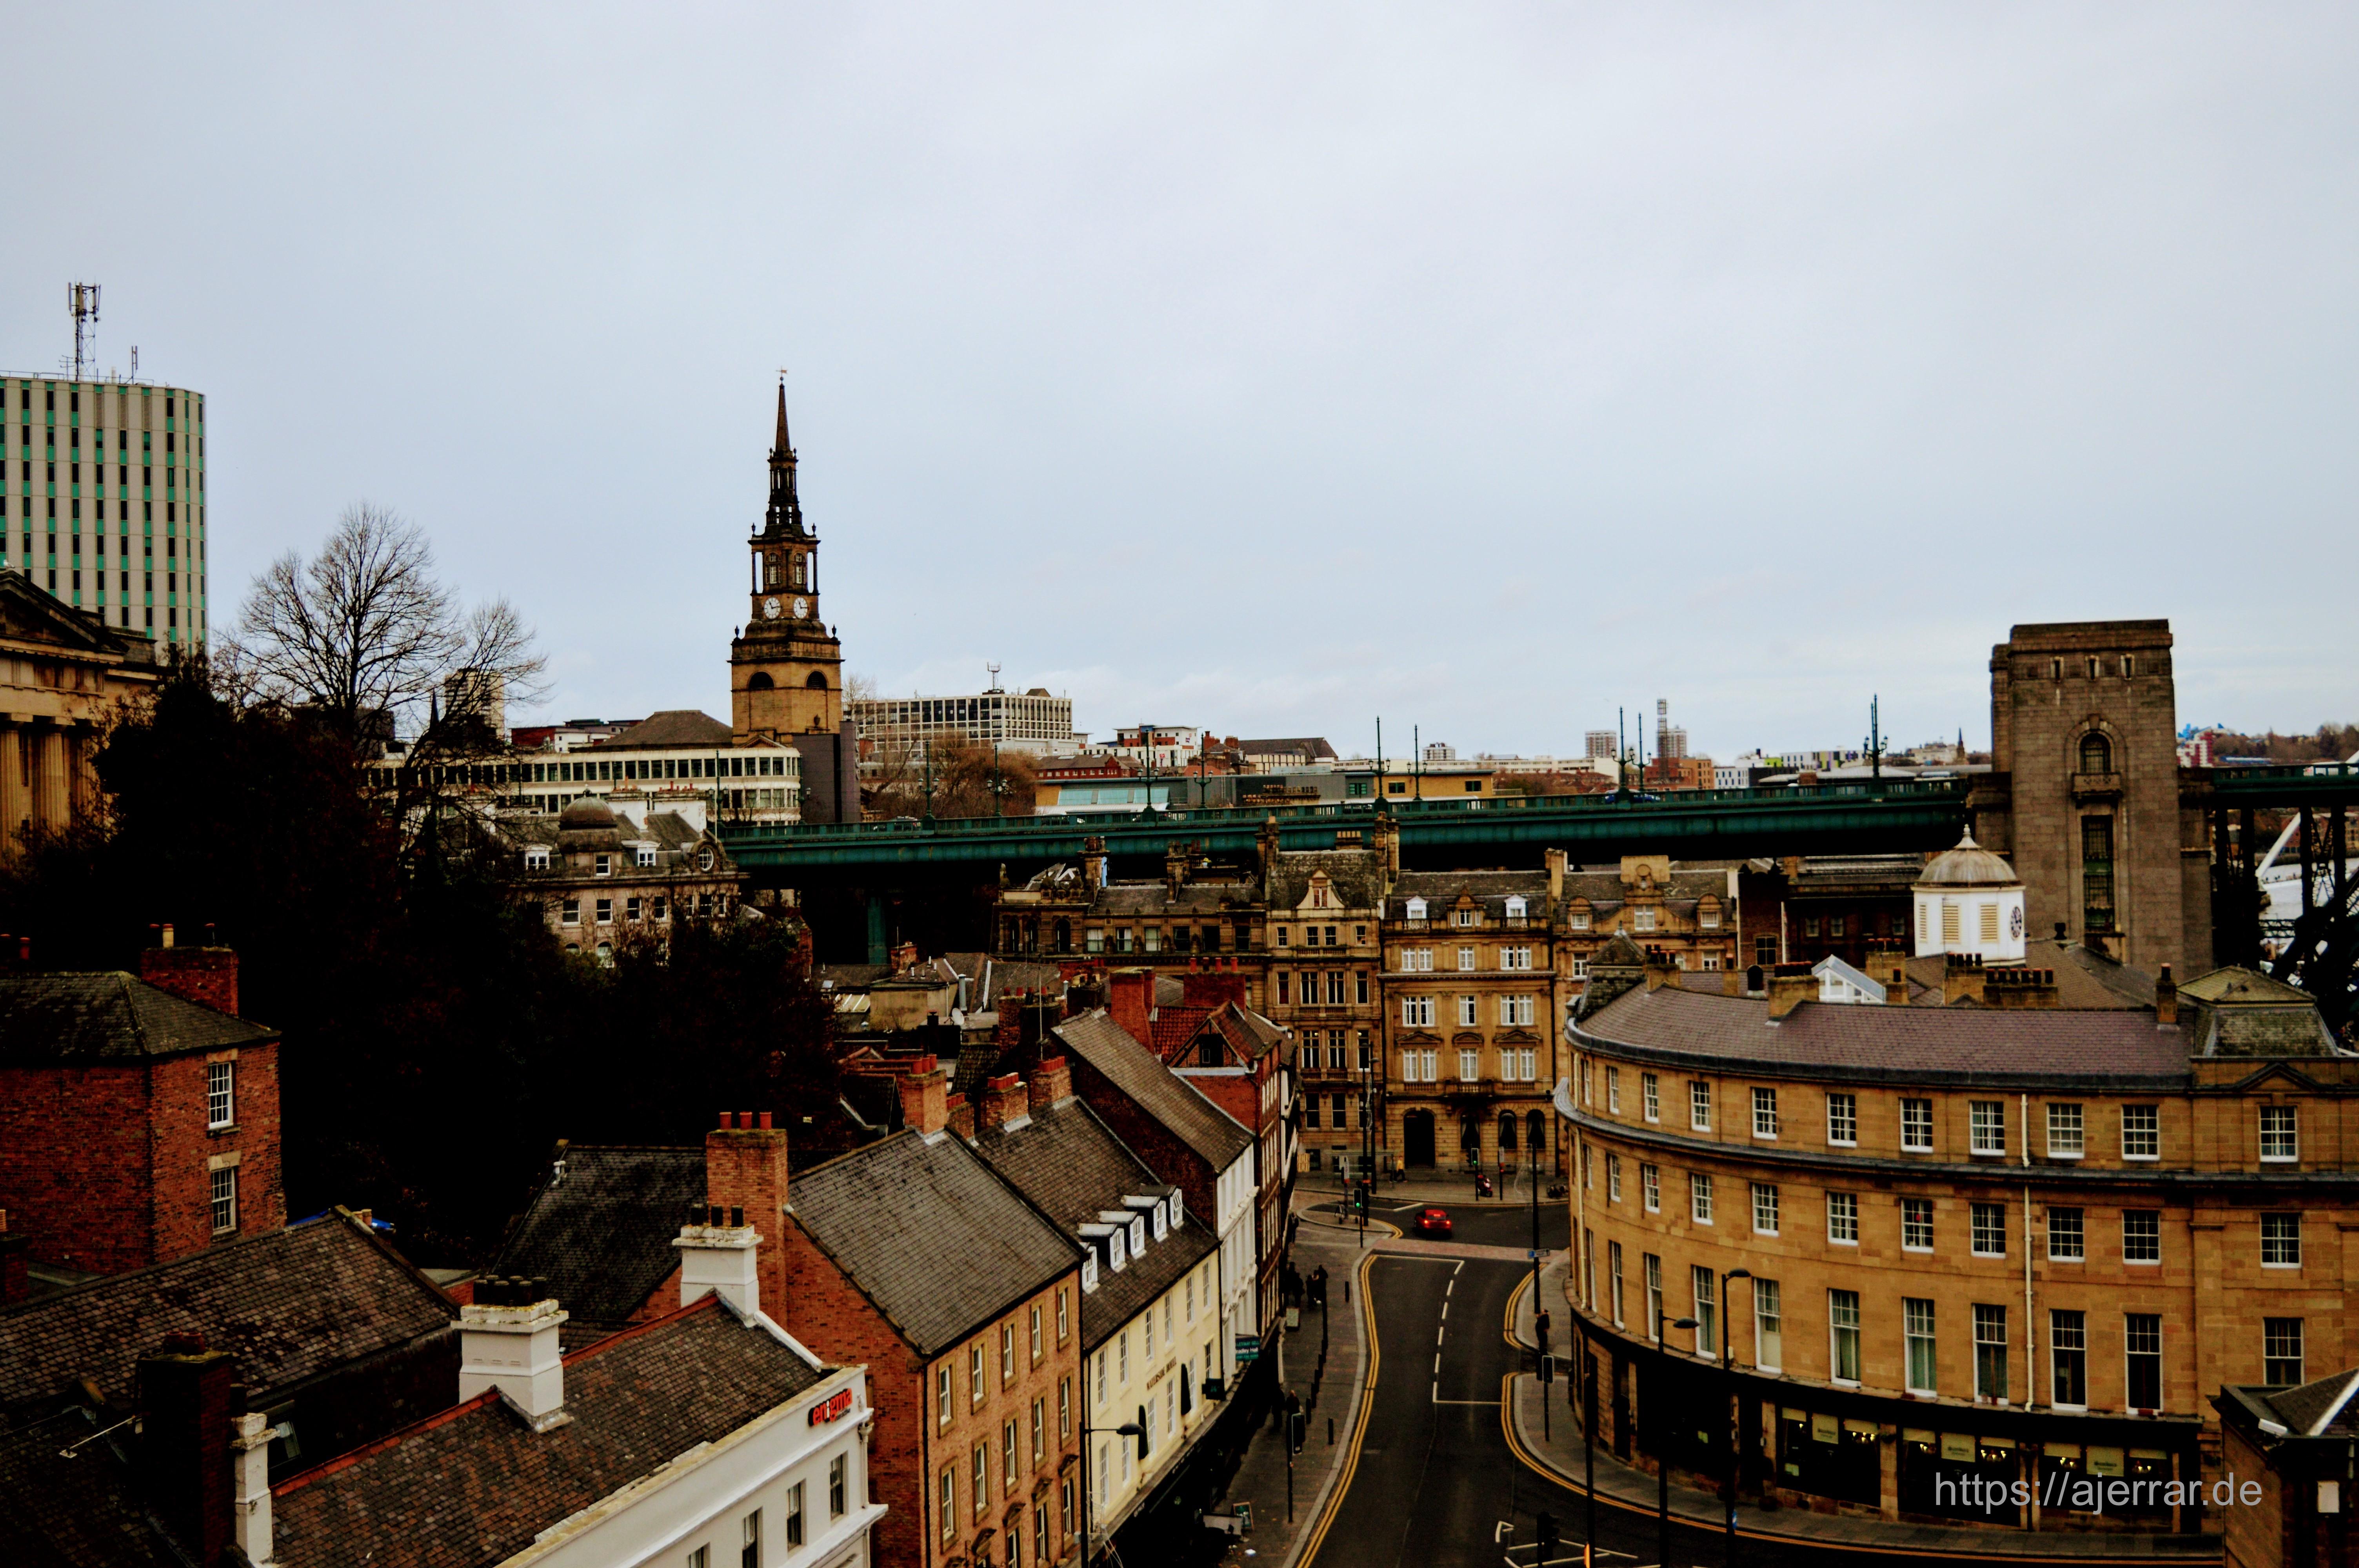 Newcastle - Bild: I. Ajerrar